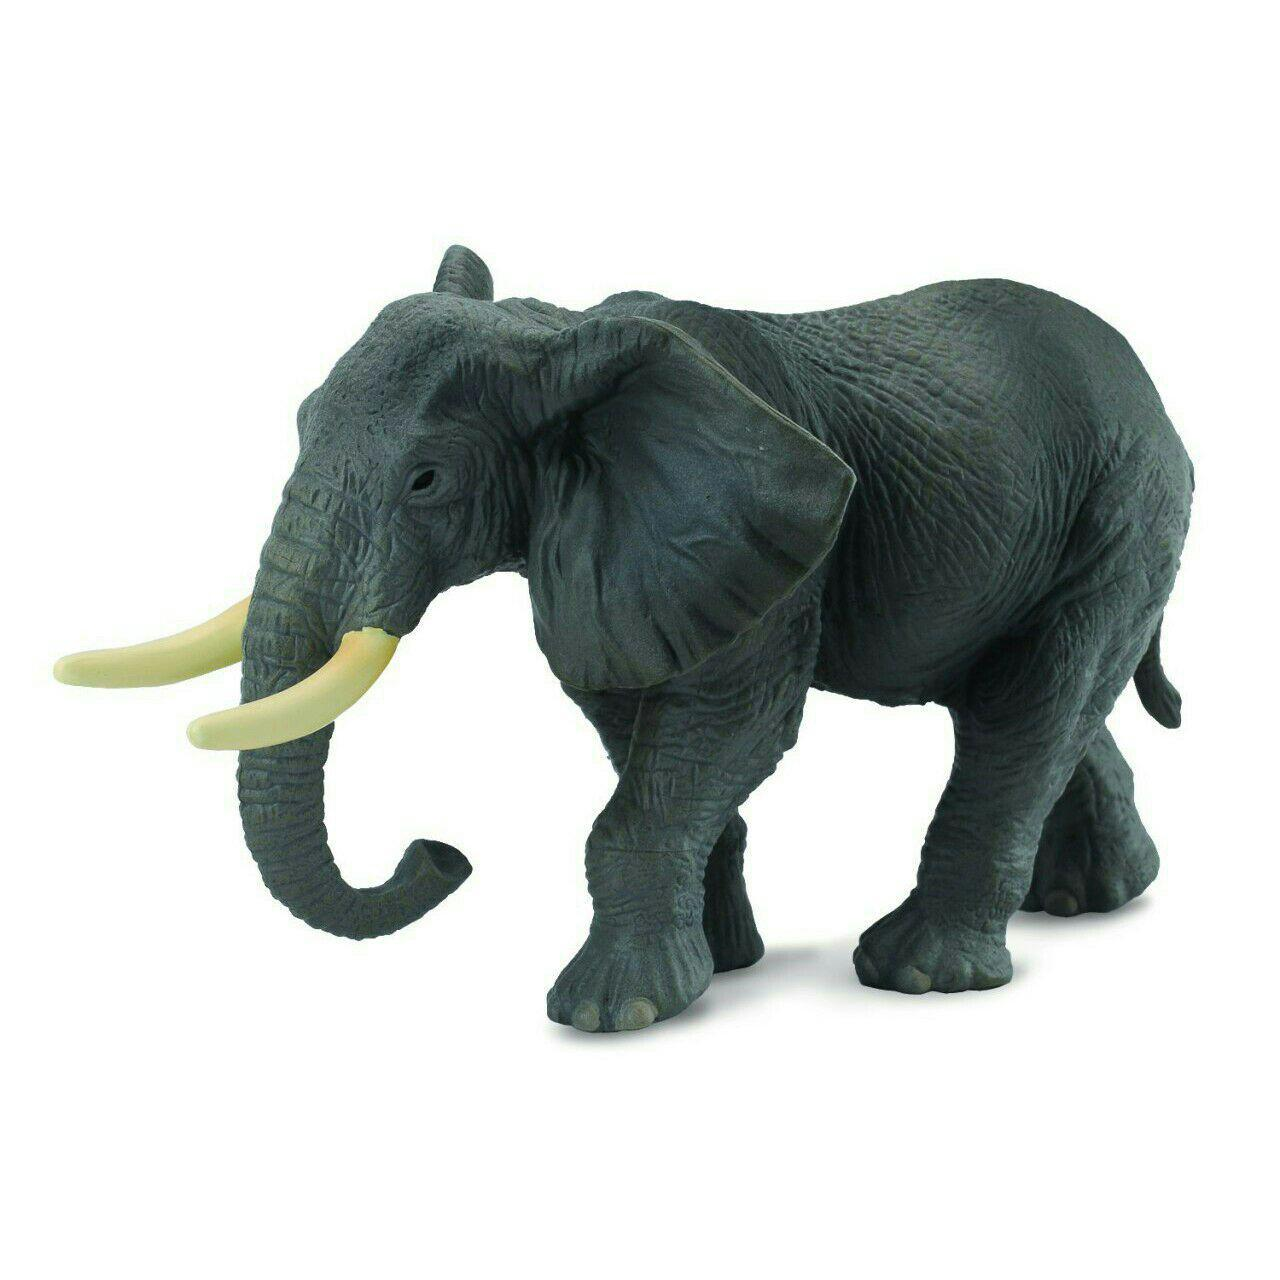 Collecta Фигурка Африканский слон, 15 см